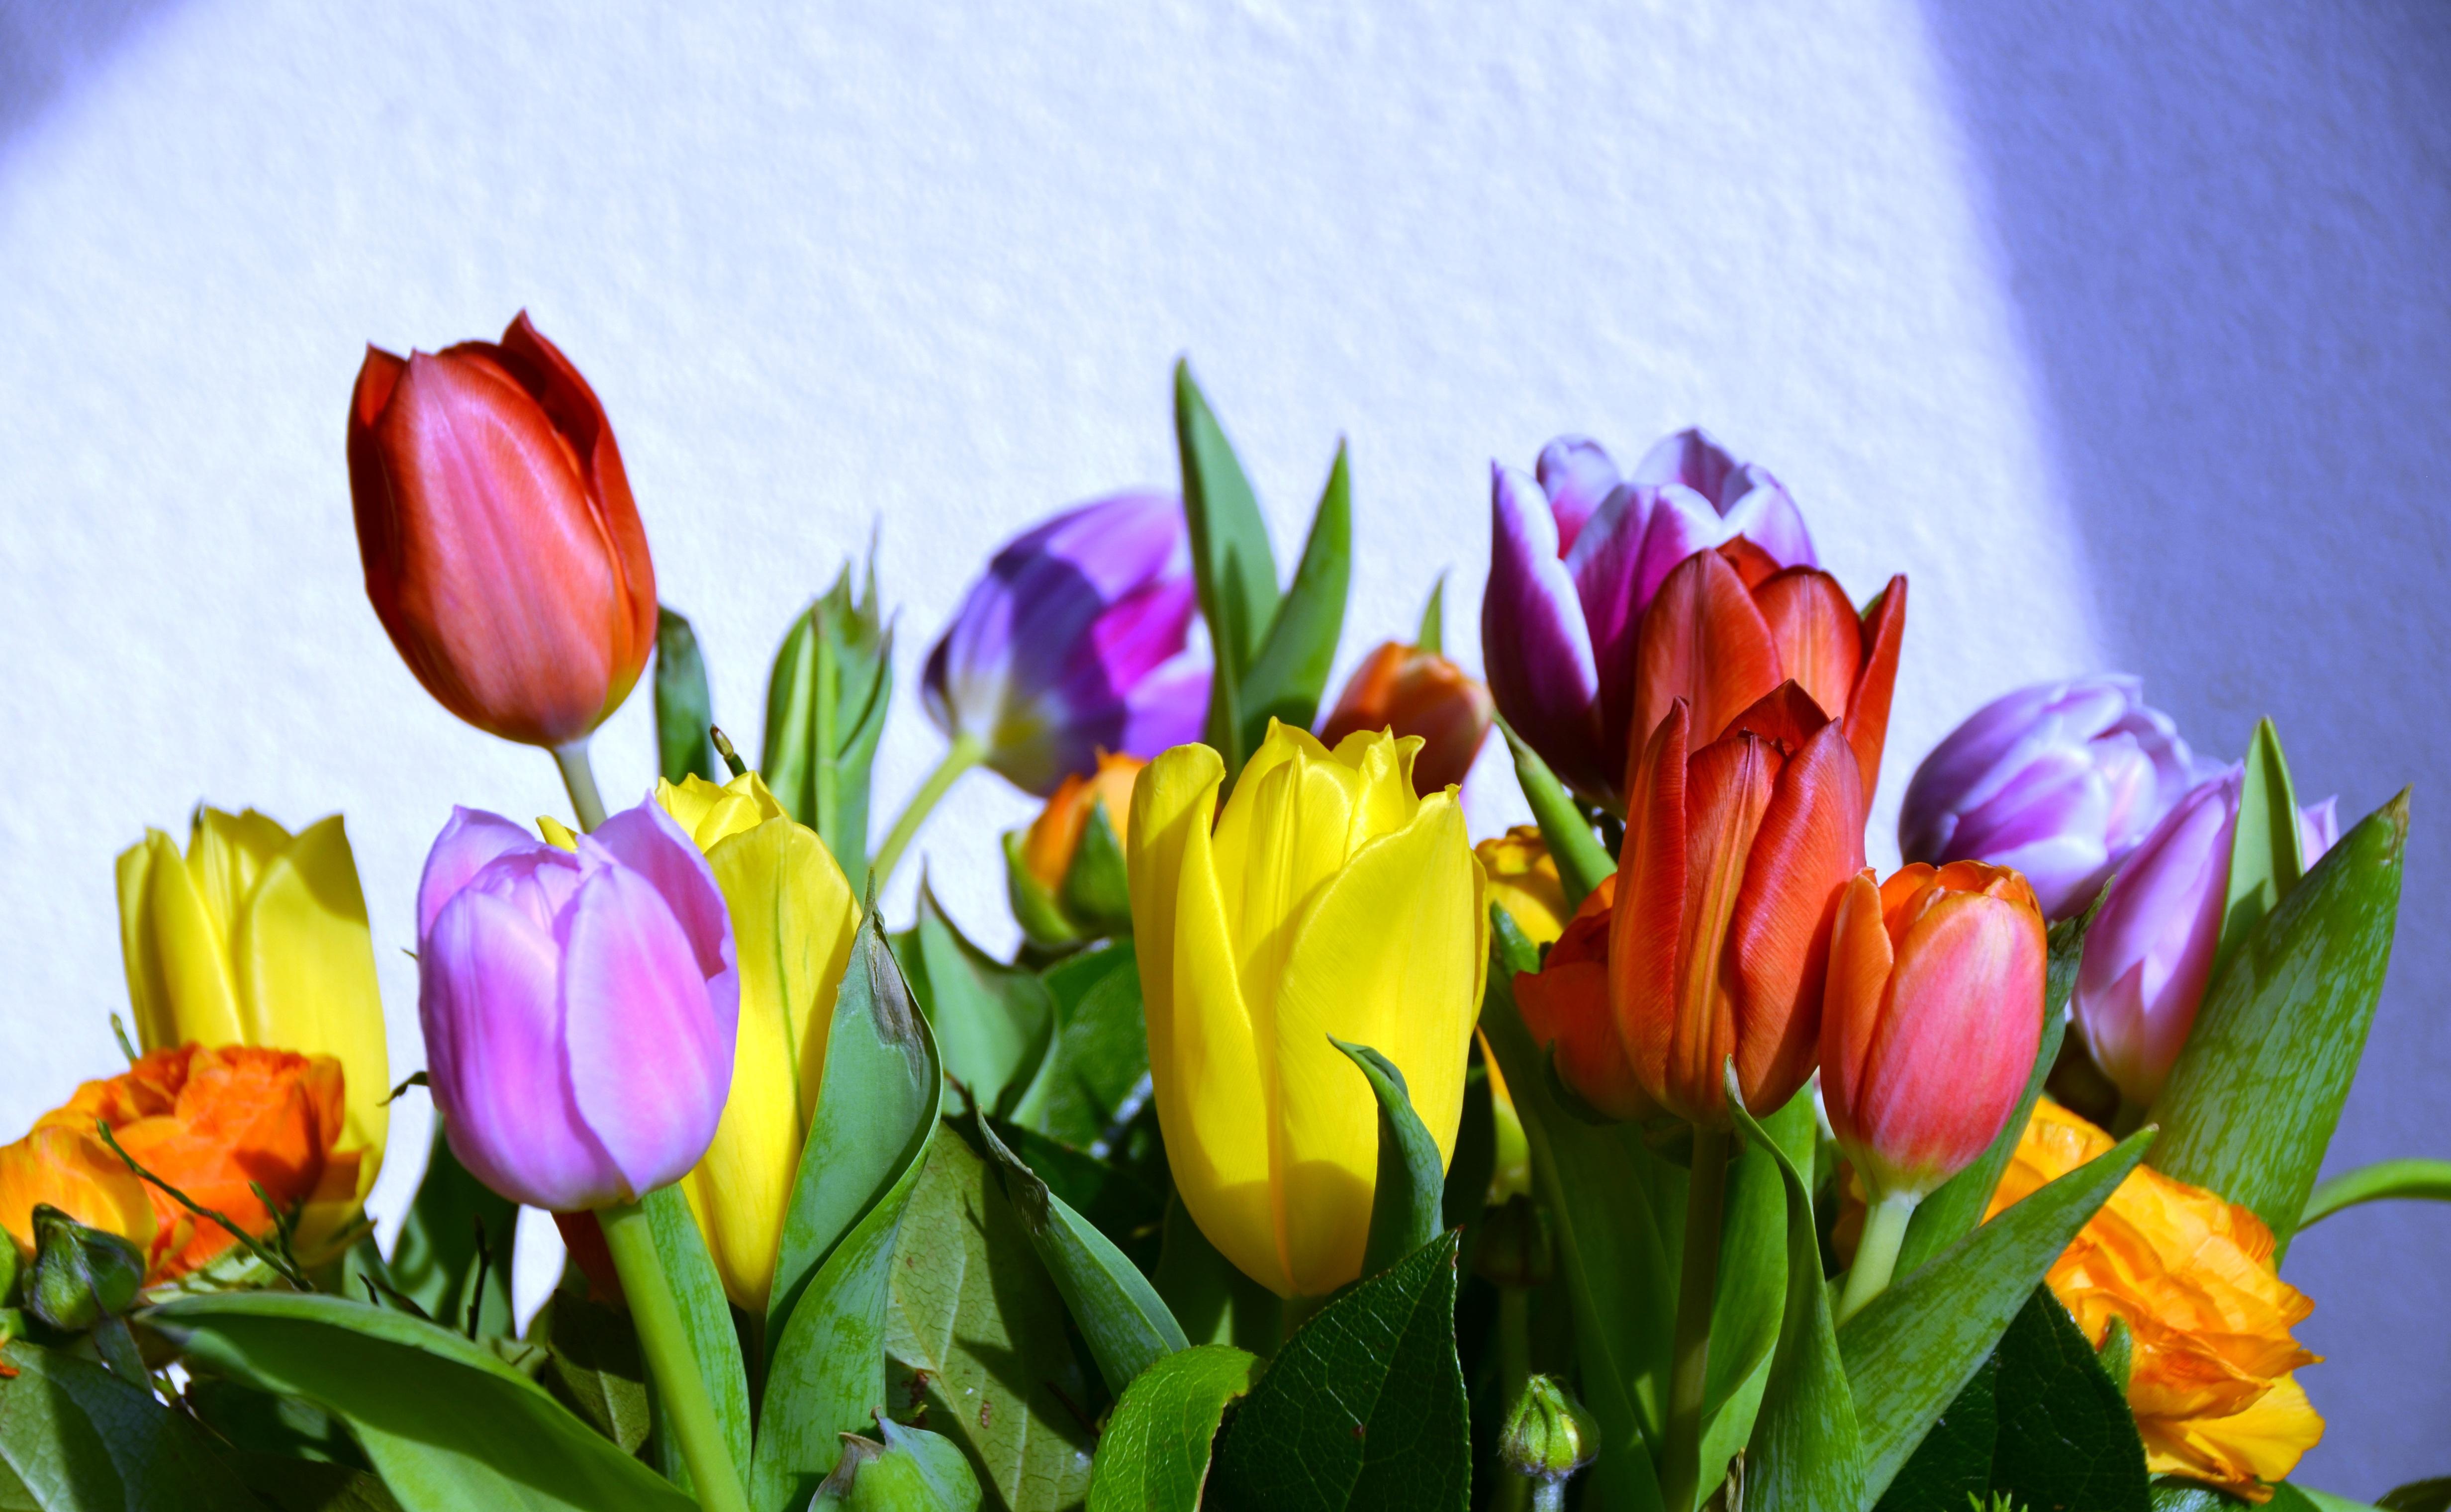 Free Images Nature Flower Petal Summer Tulip Spring Color